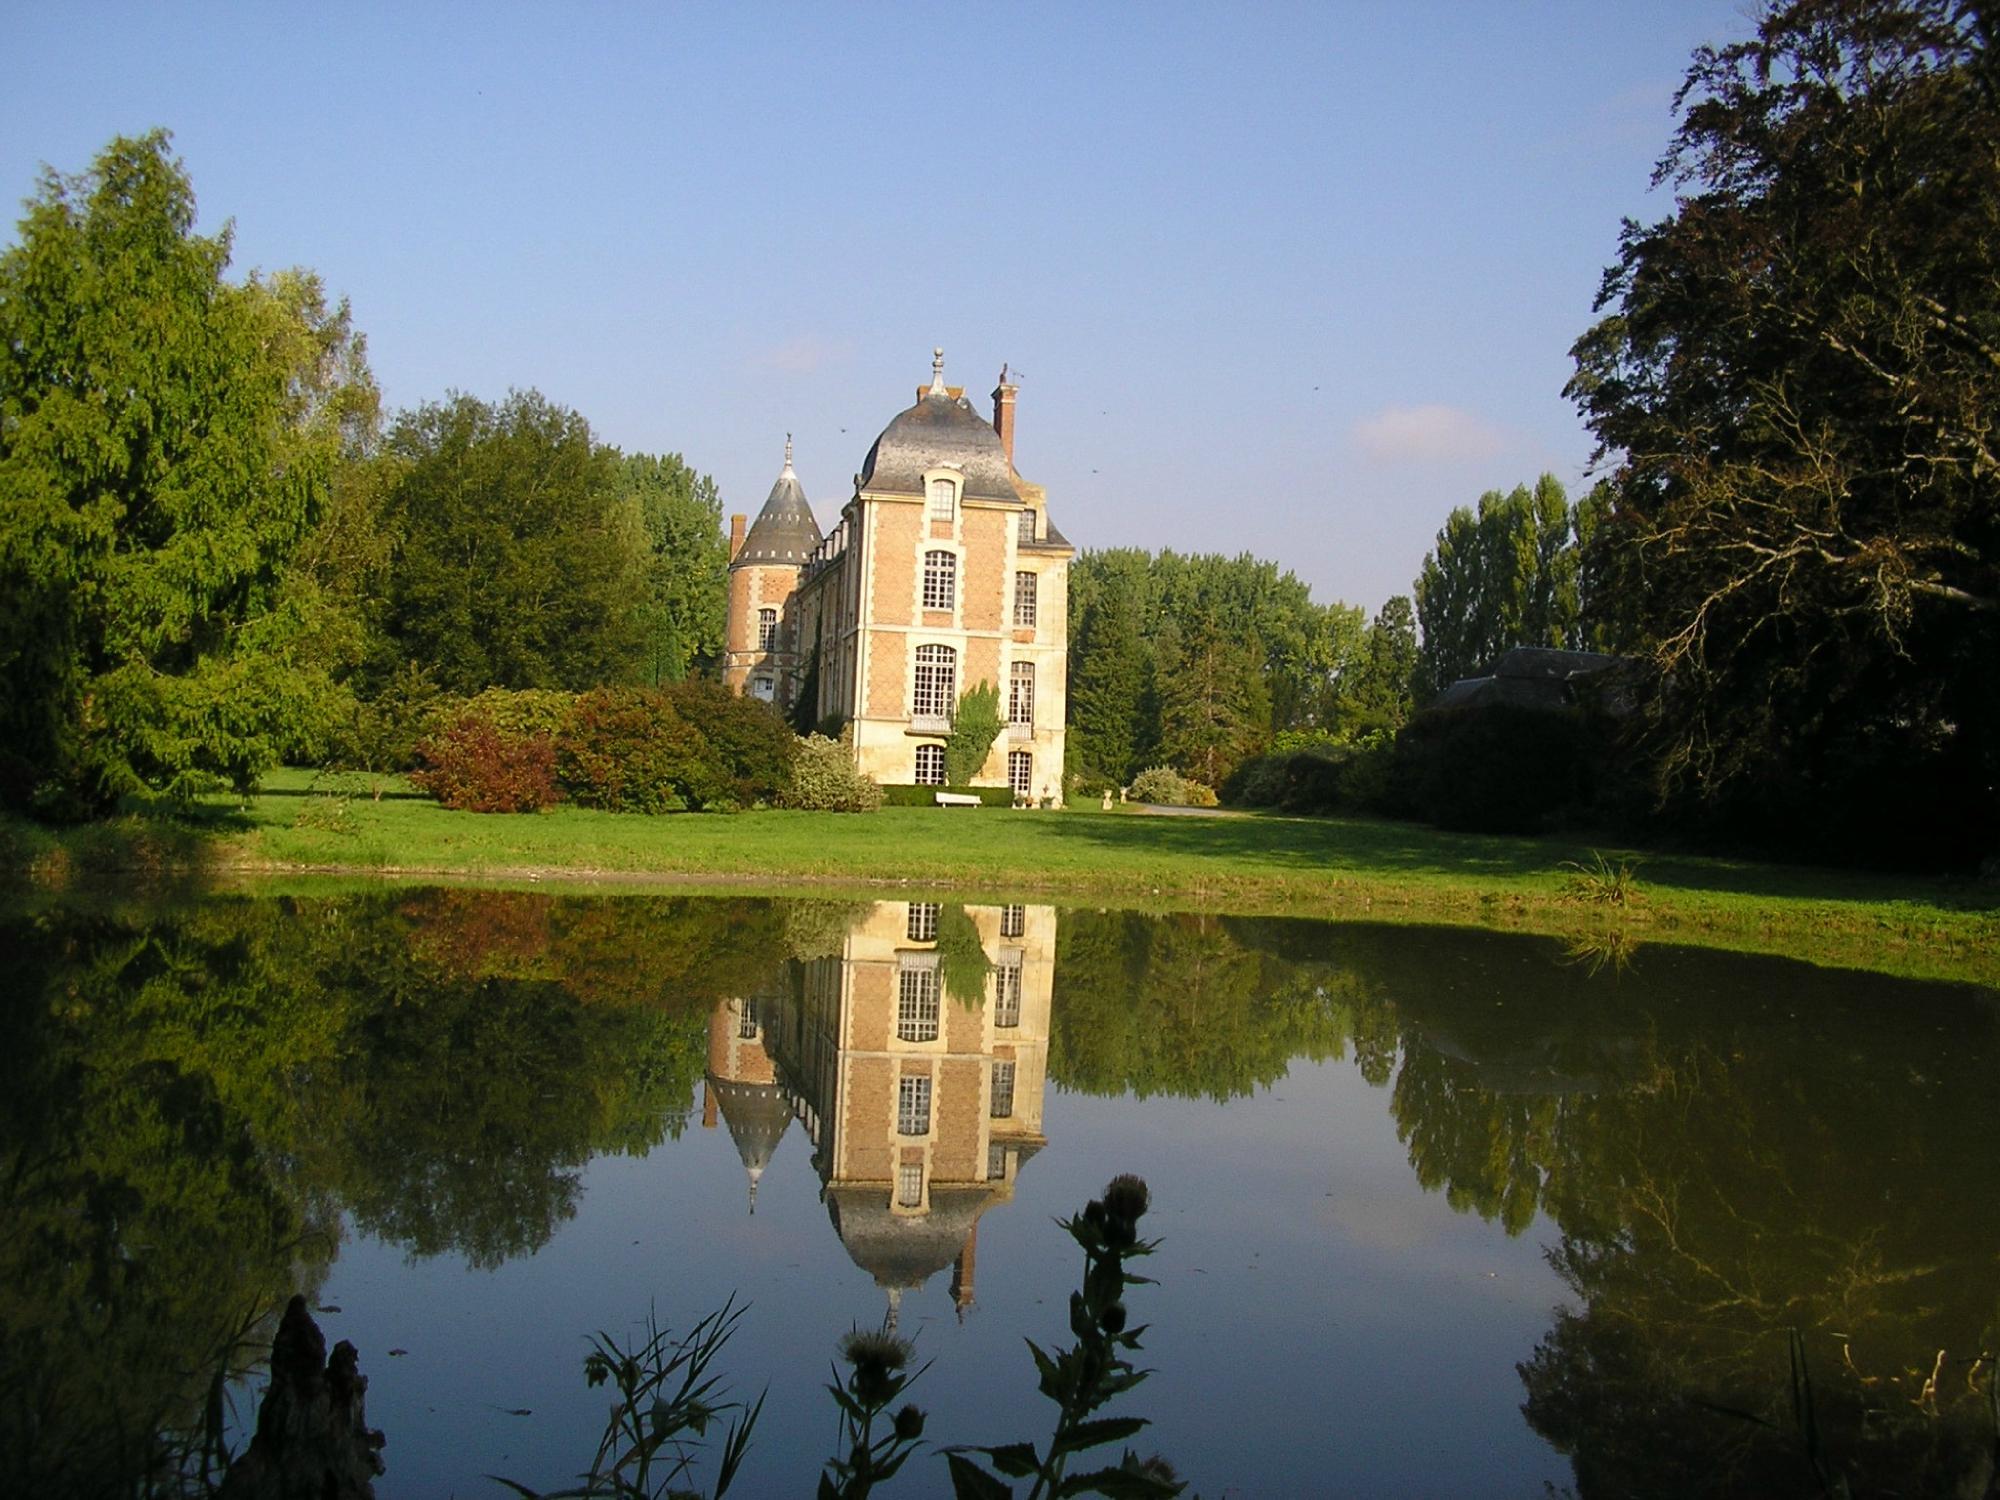 Chateau de Fosseuse